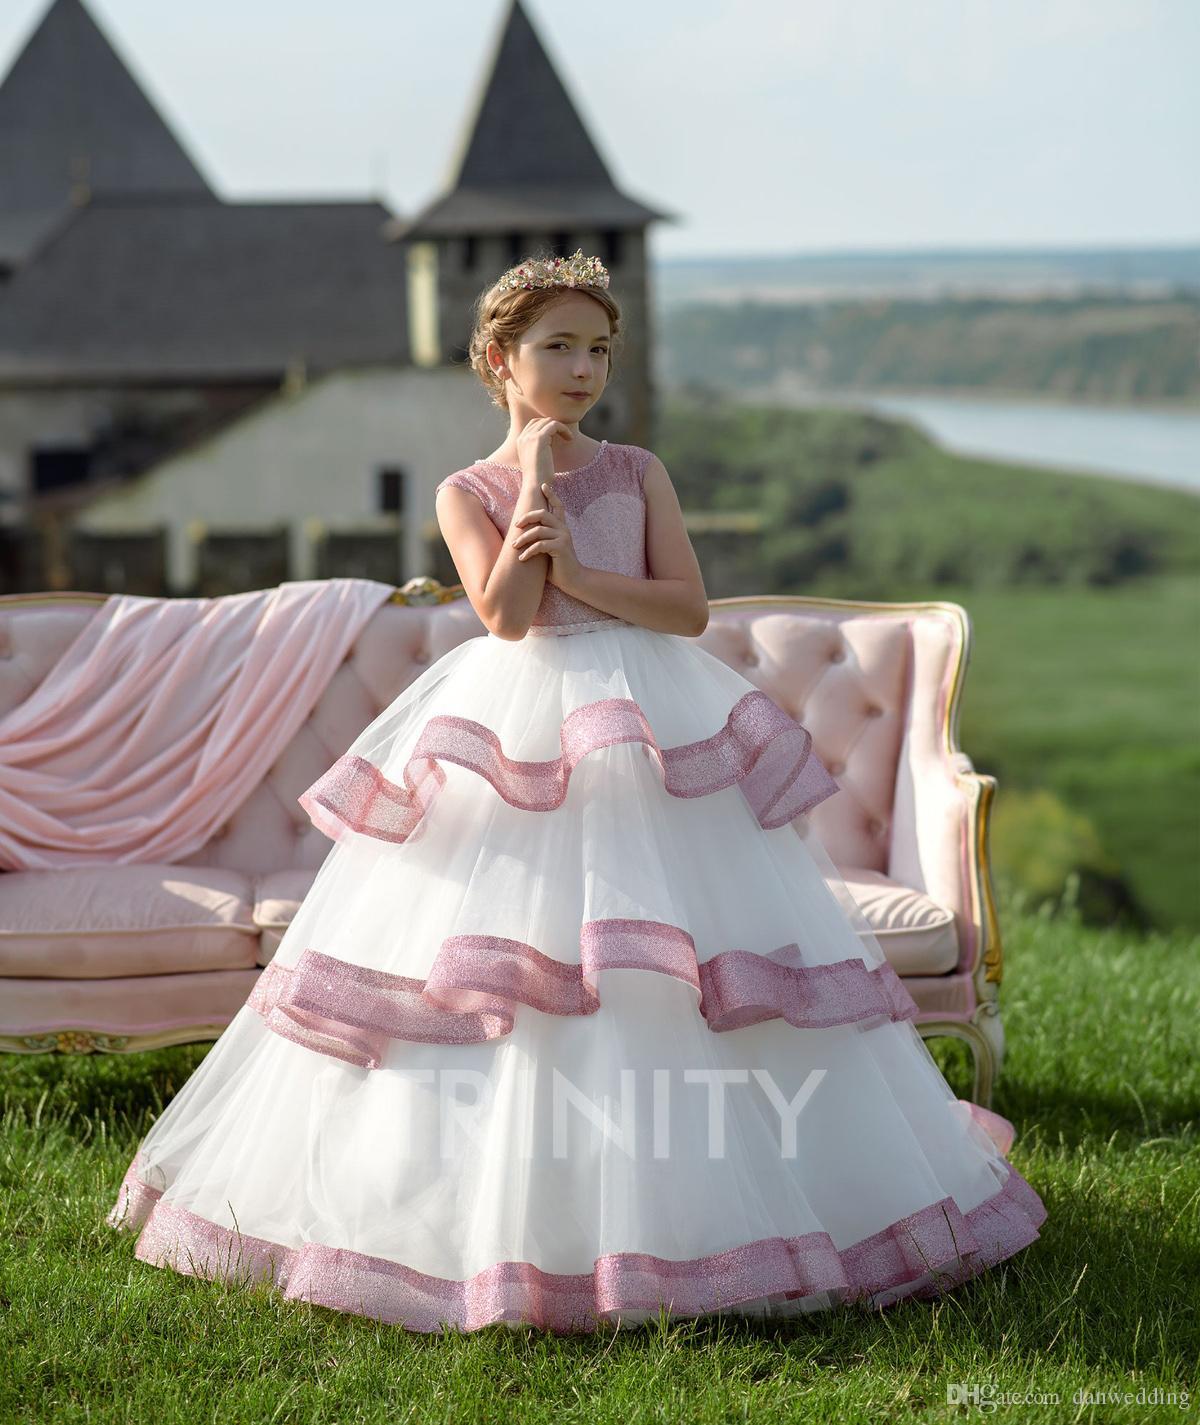 Beauty White/Pink Layers Beads Girl's Pageant Dresses Flower Girl Dresses Holidays/Birthday Skirt Princess Skirt Custom Size 2-14 F113163